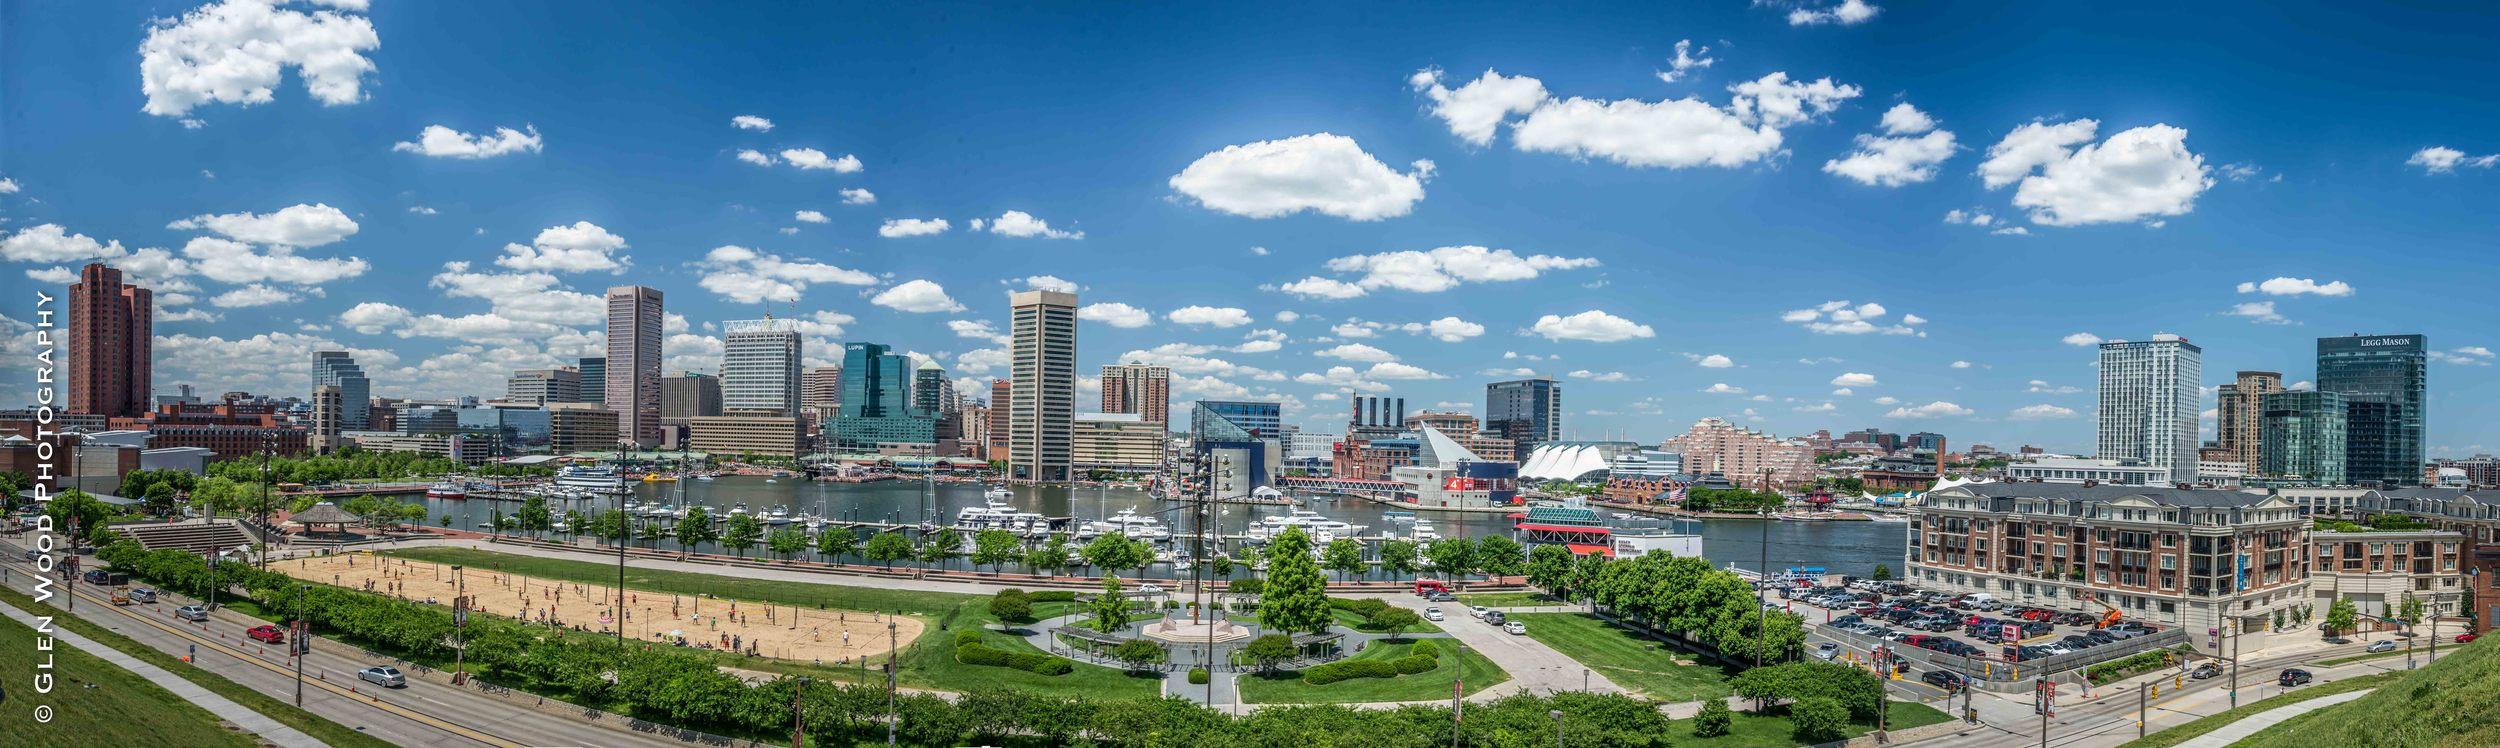 Panoramic Baltimore Federal Hill 2014